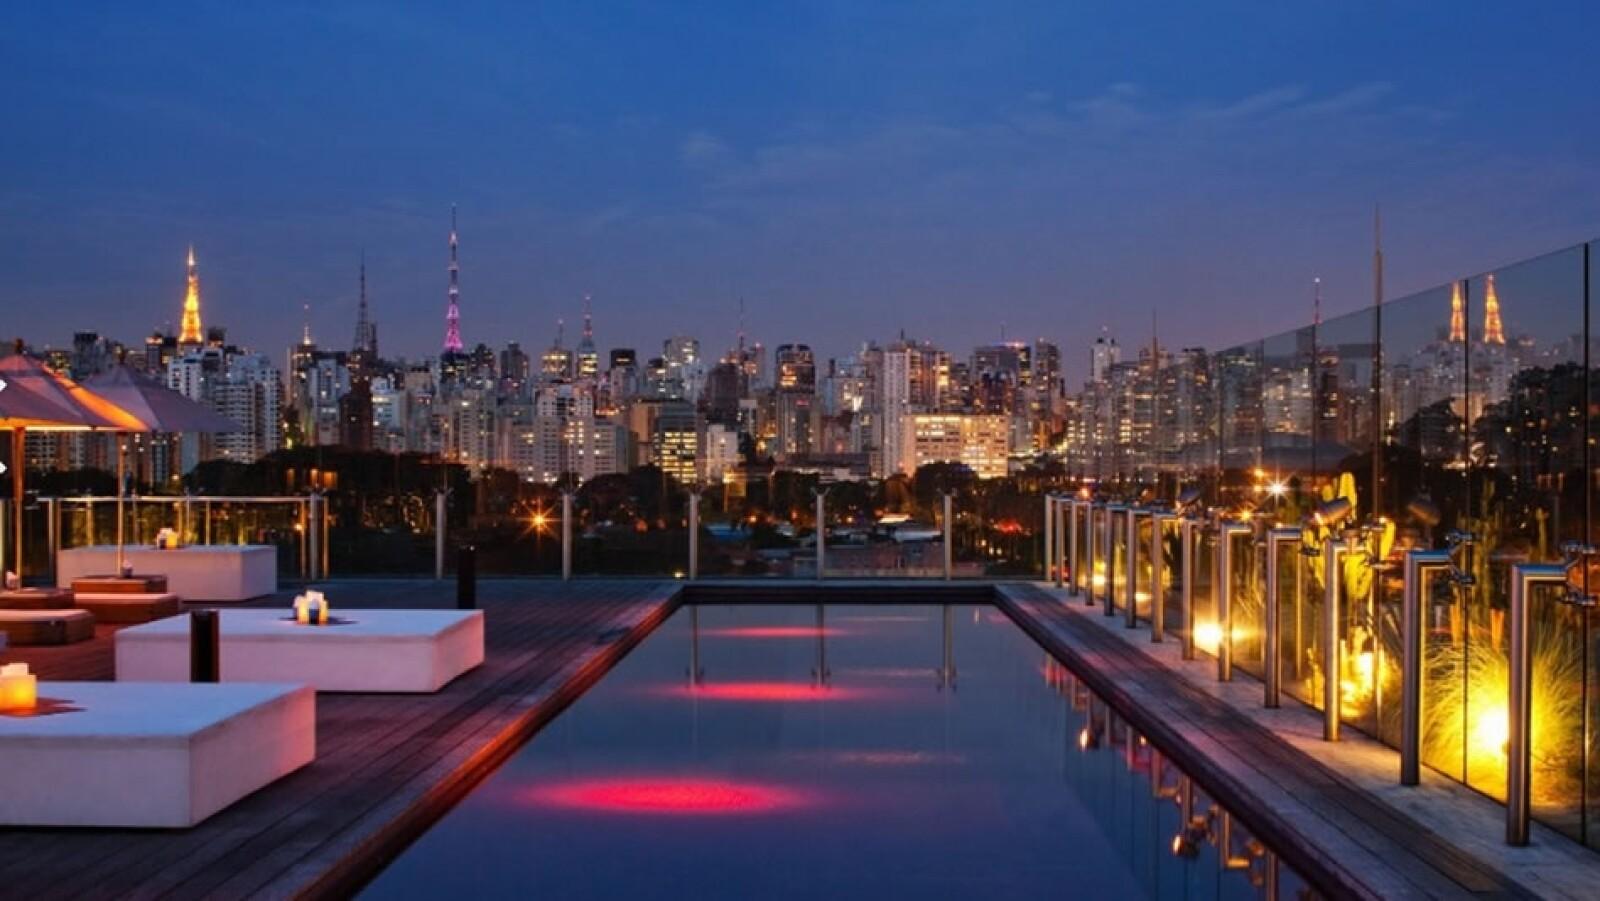 Skye Bar & Restaurante, Hotel Unique (São Paulo, Brasil)